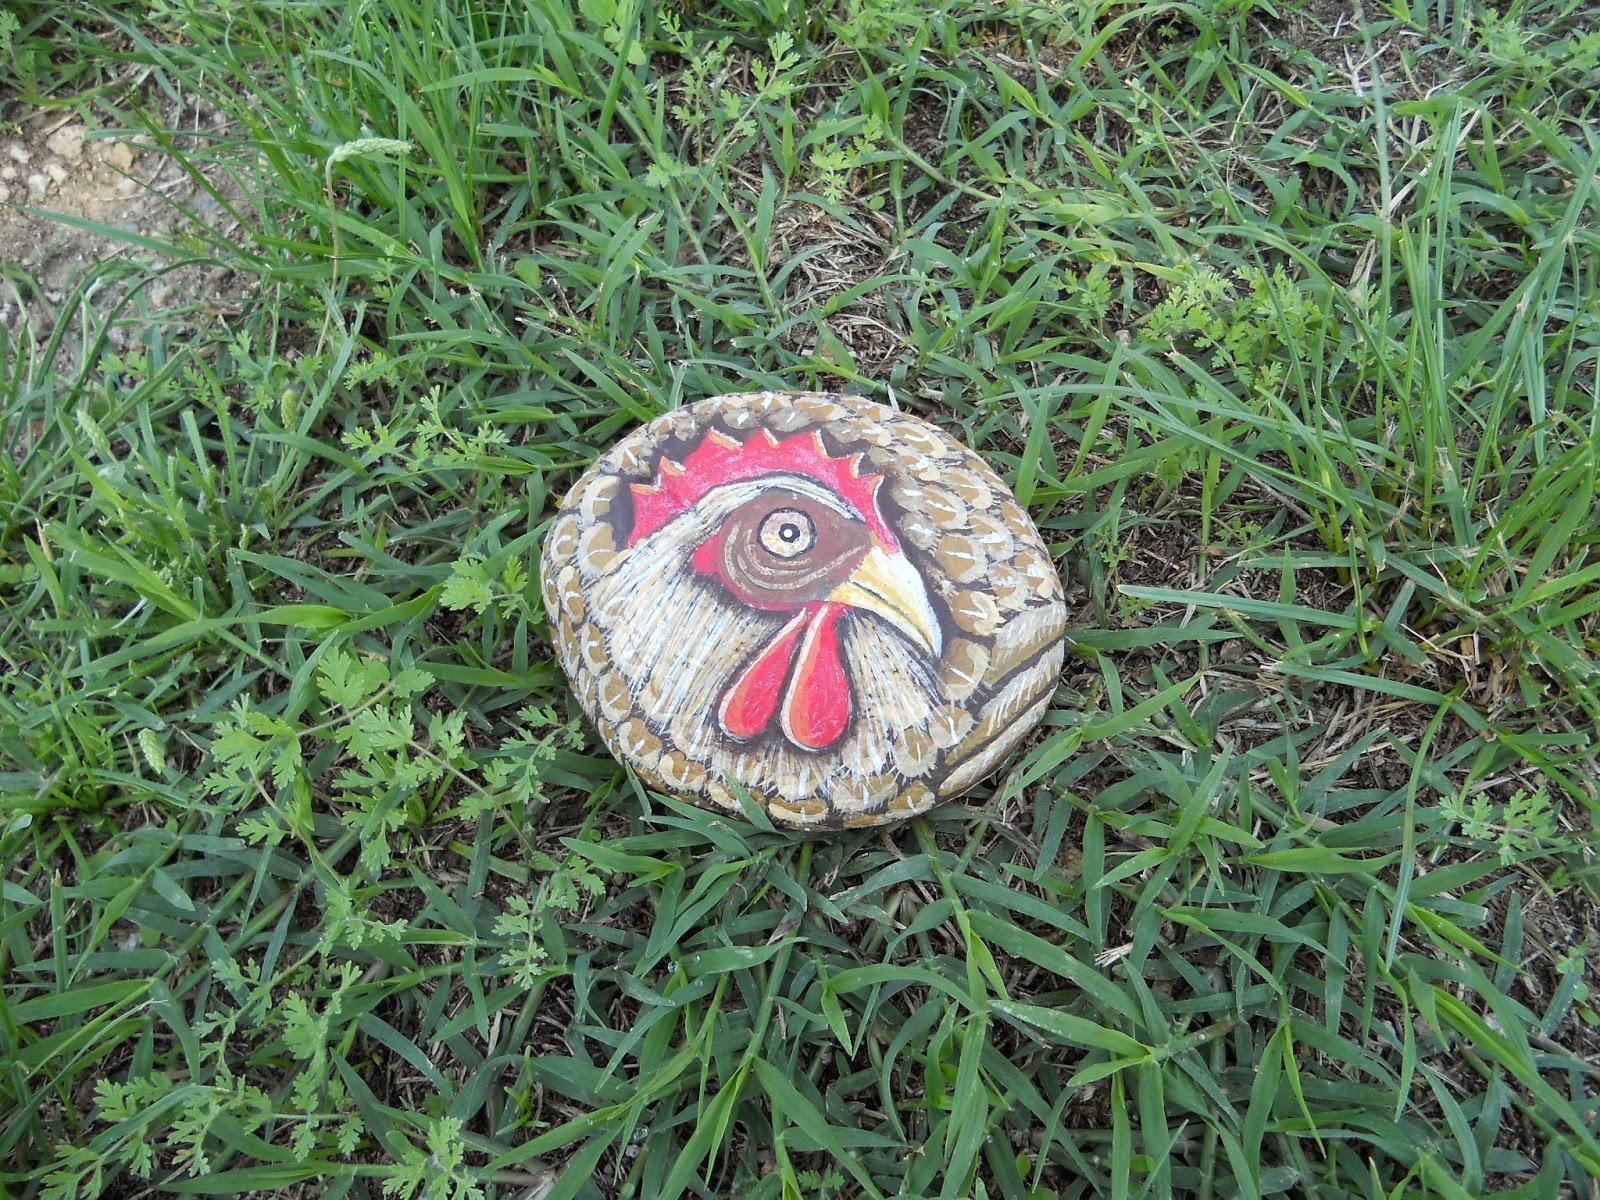 piedra pintada a mano: gallina